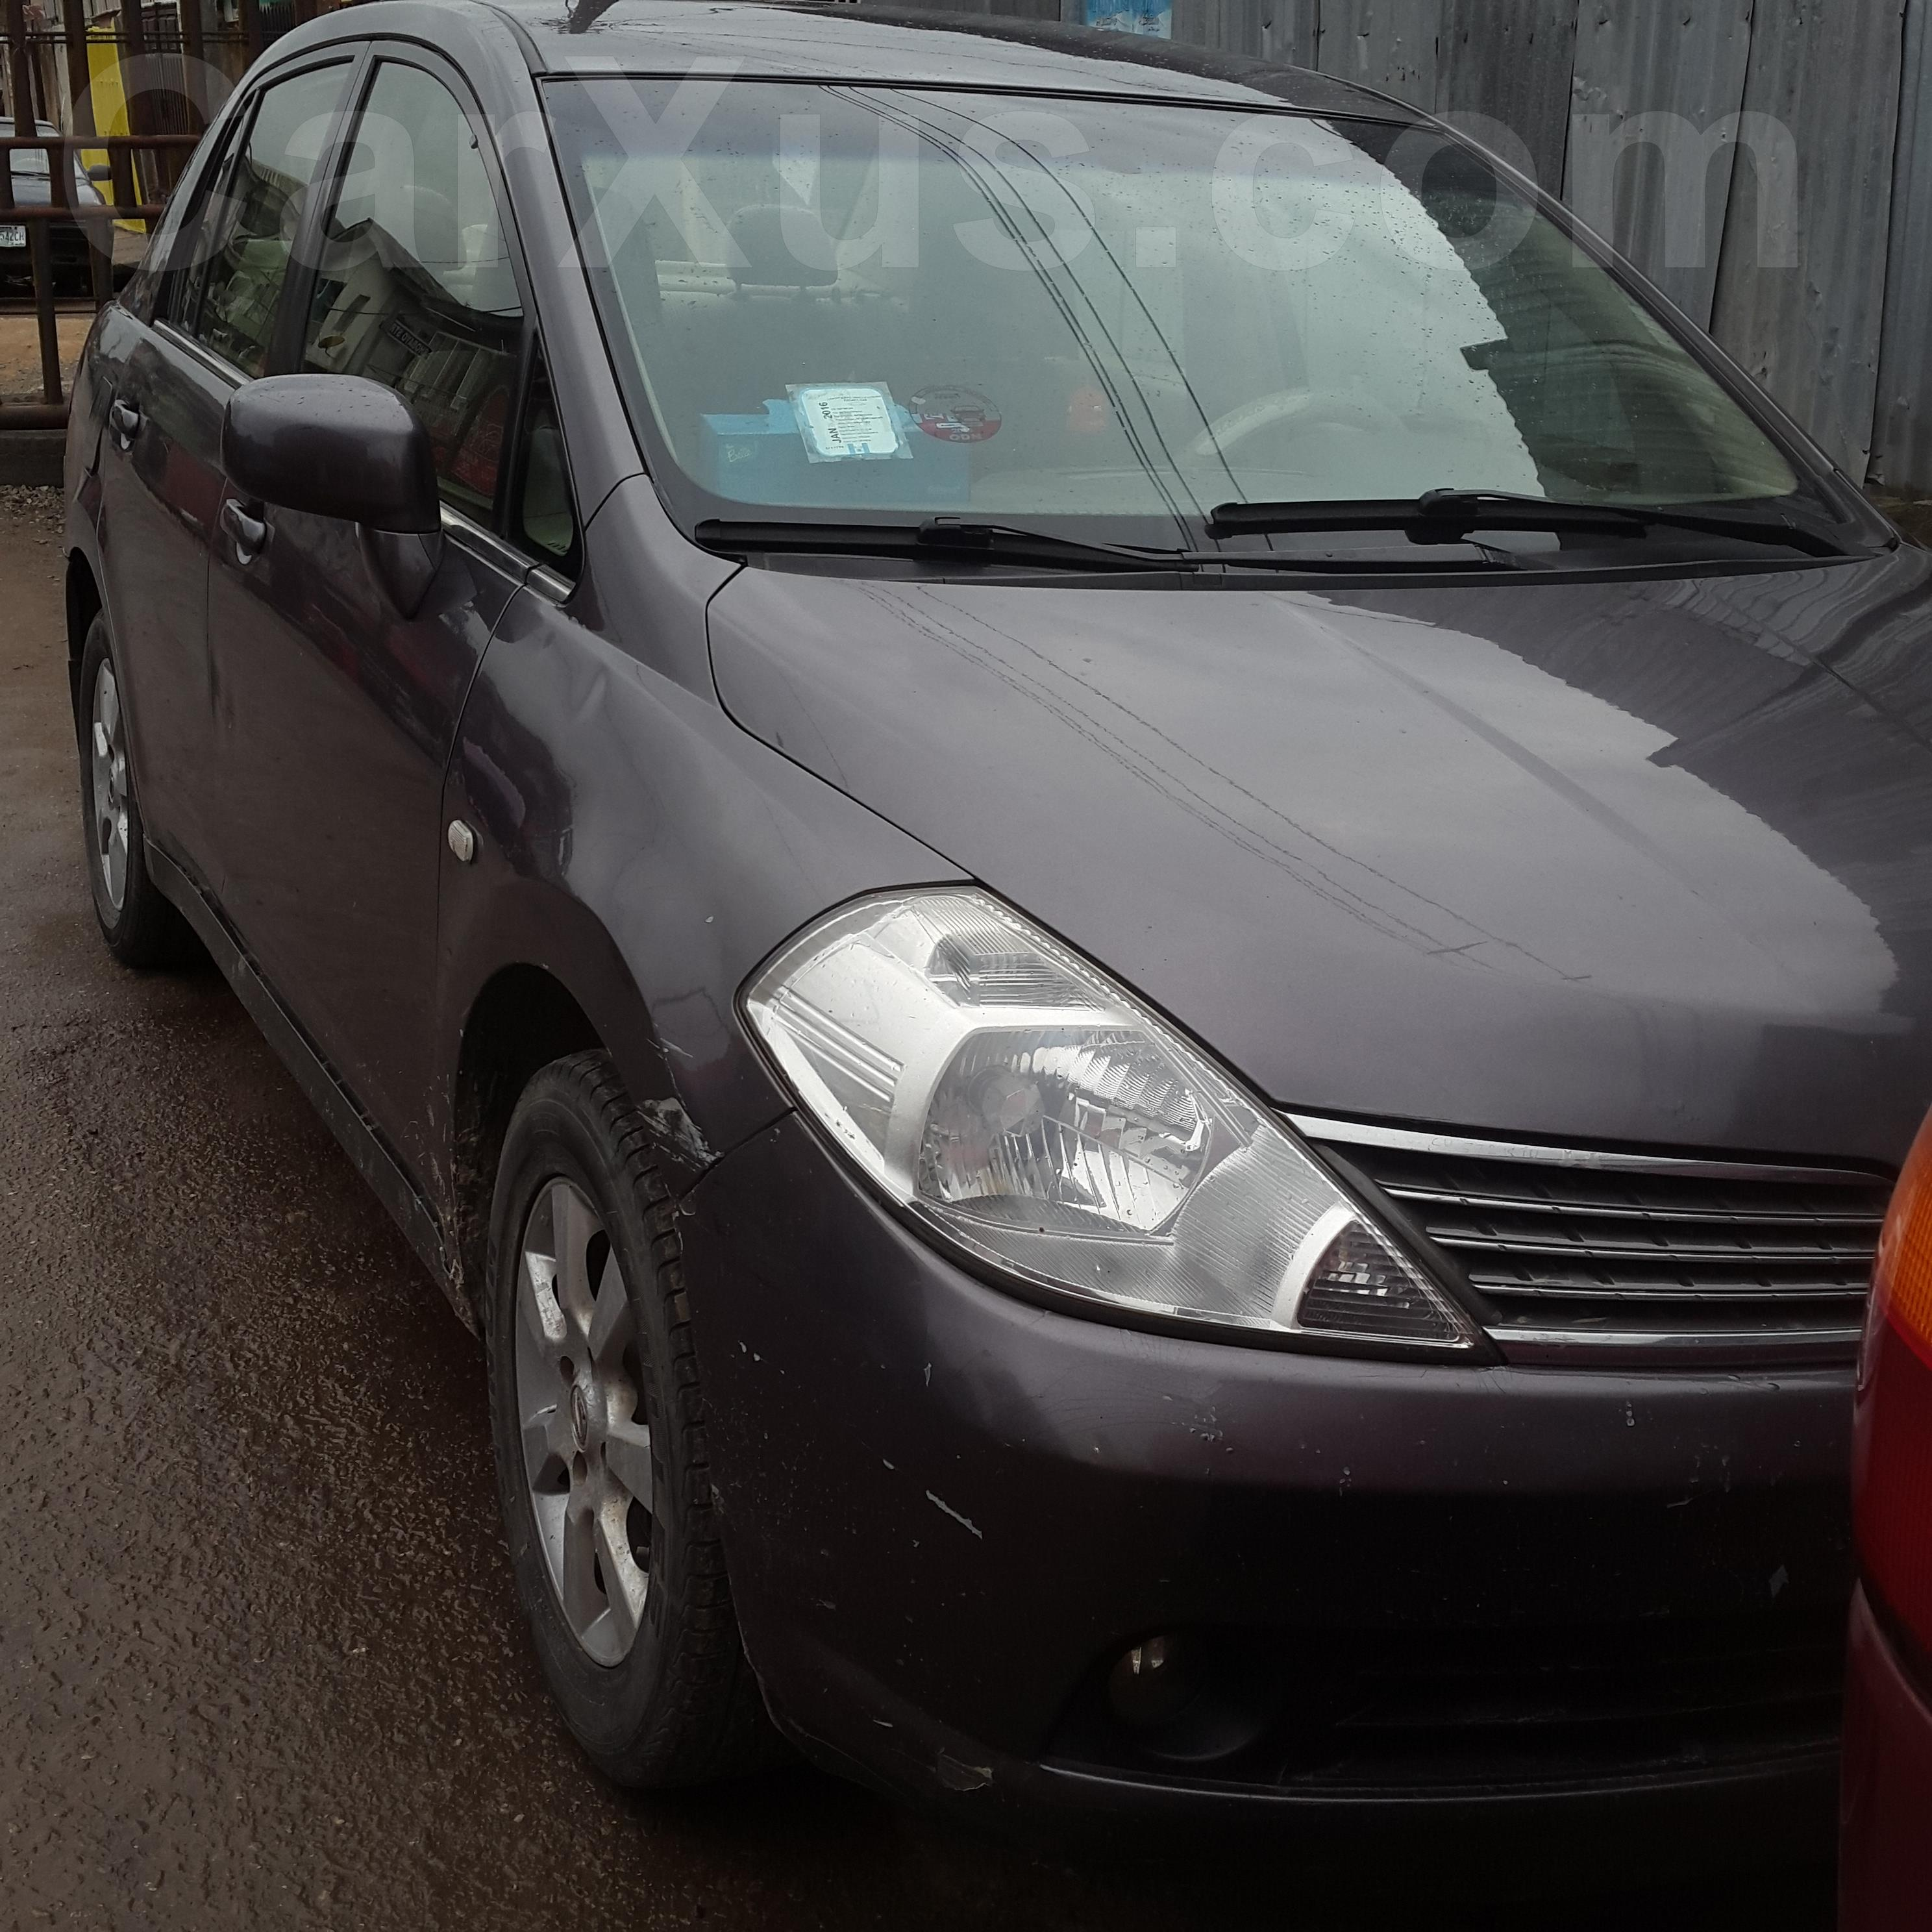 2010 Nissan Tiida Buy Used Auto Car Online In Lagos Nigeria